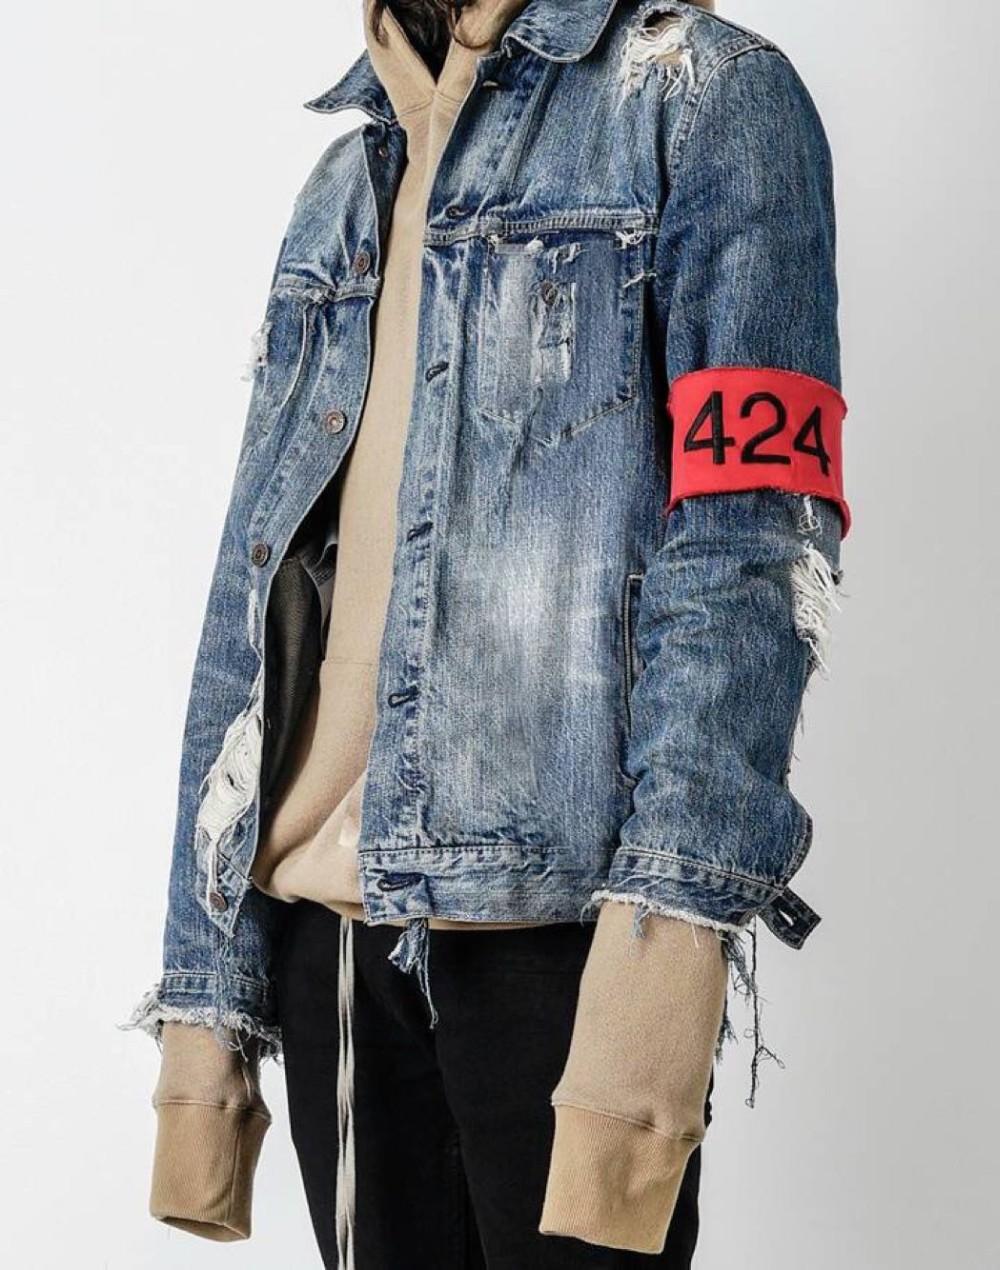 Kpop Four Two Four Denim Jacket On Storenvy